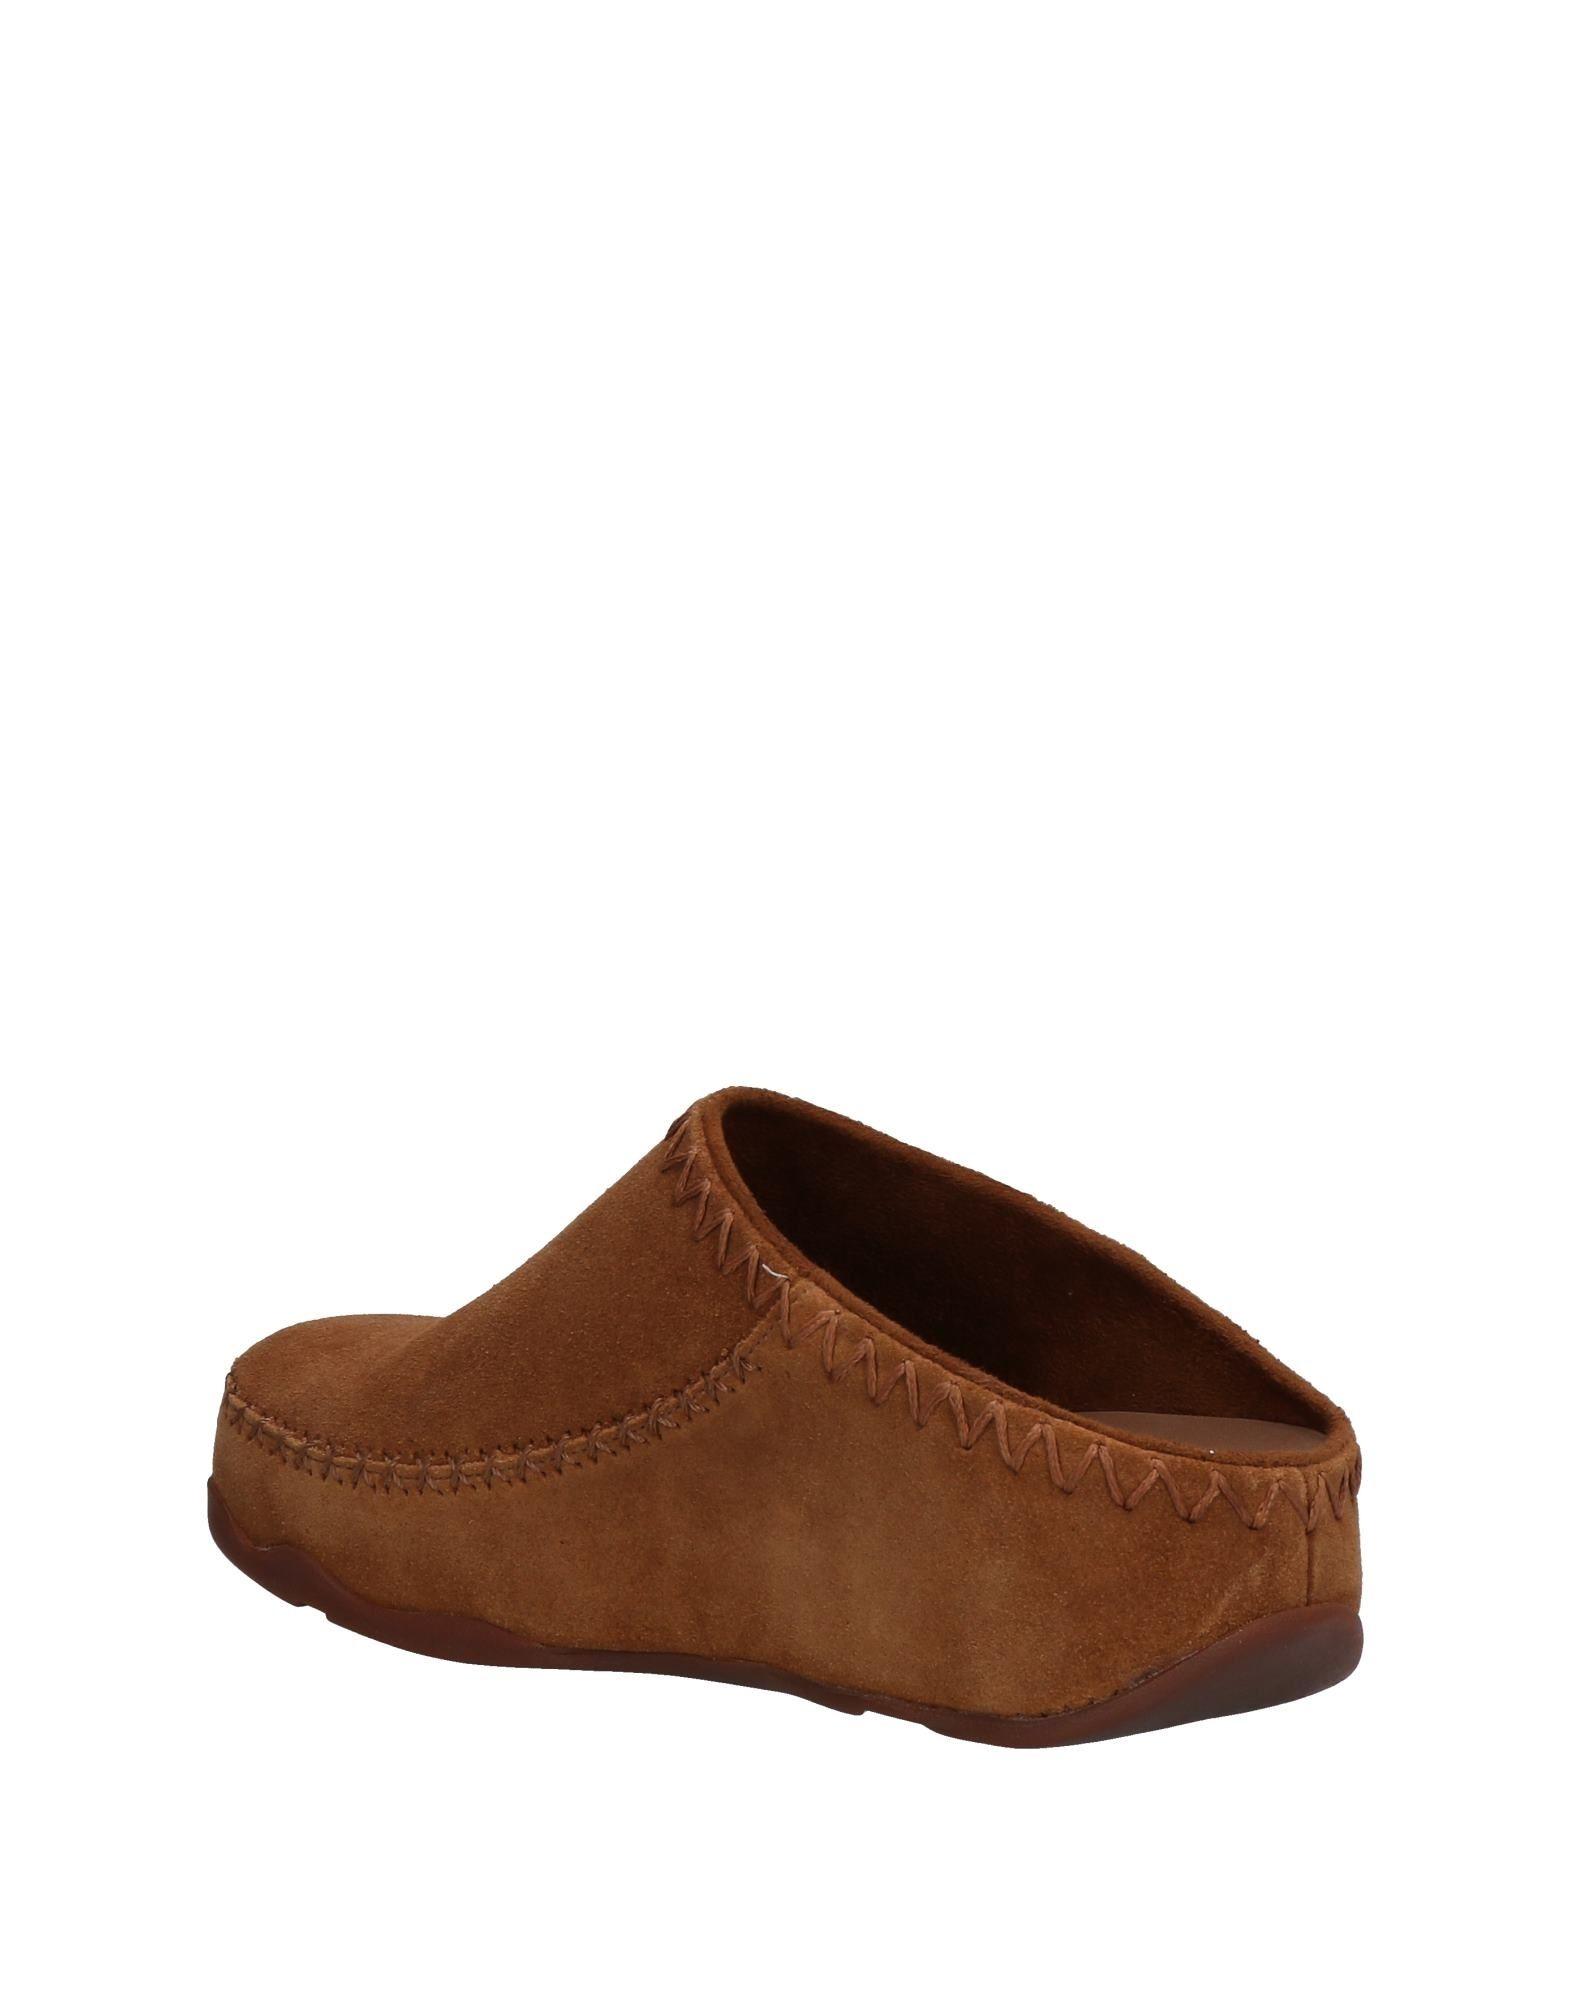 Fitflop Pantoletten Damen  Qualität 11474591RI Gute Qualität  beliebte Schuhe db1fca